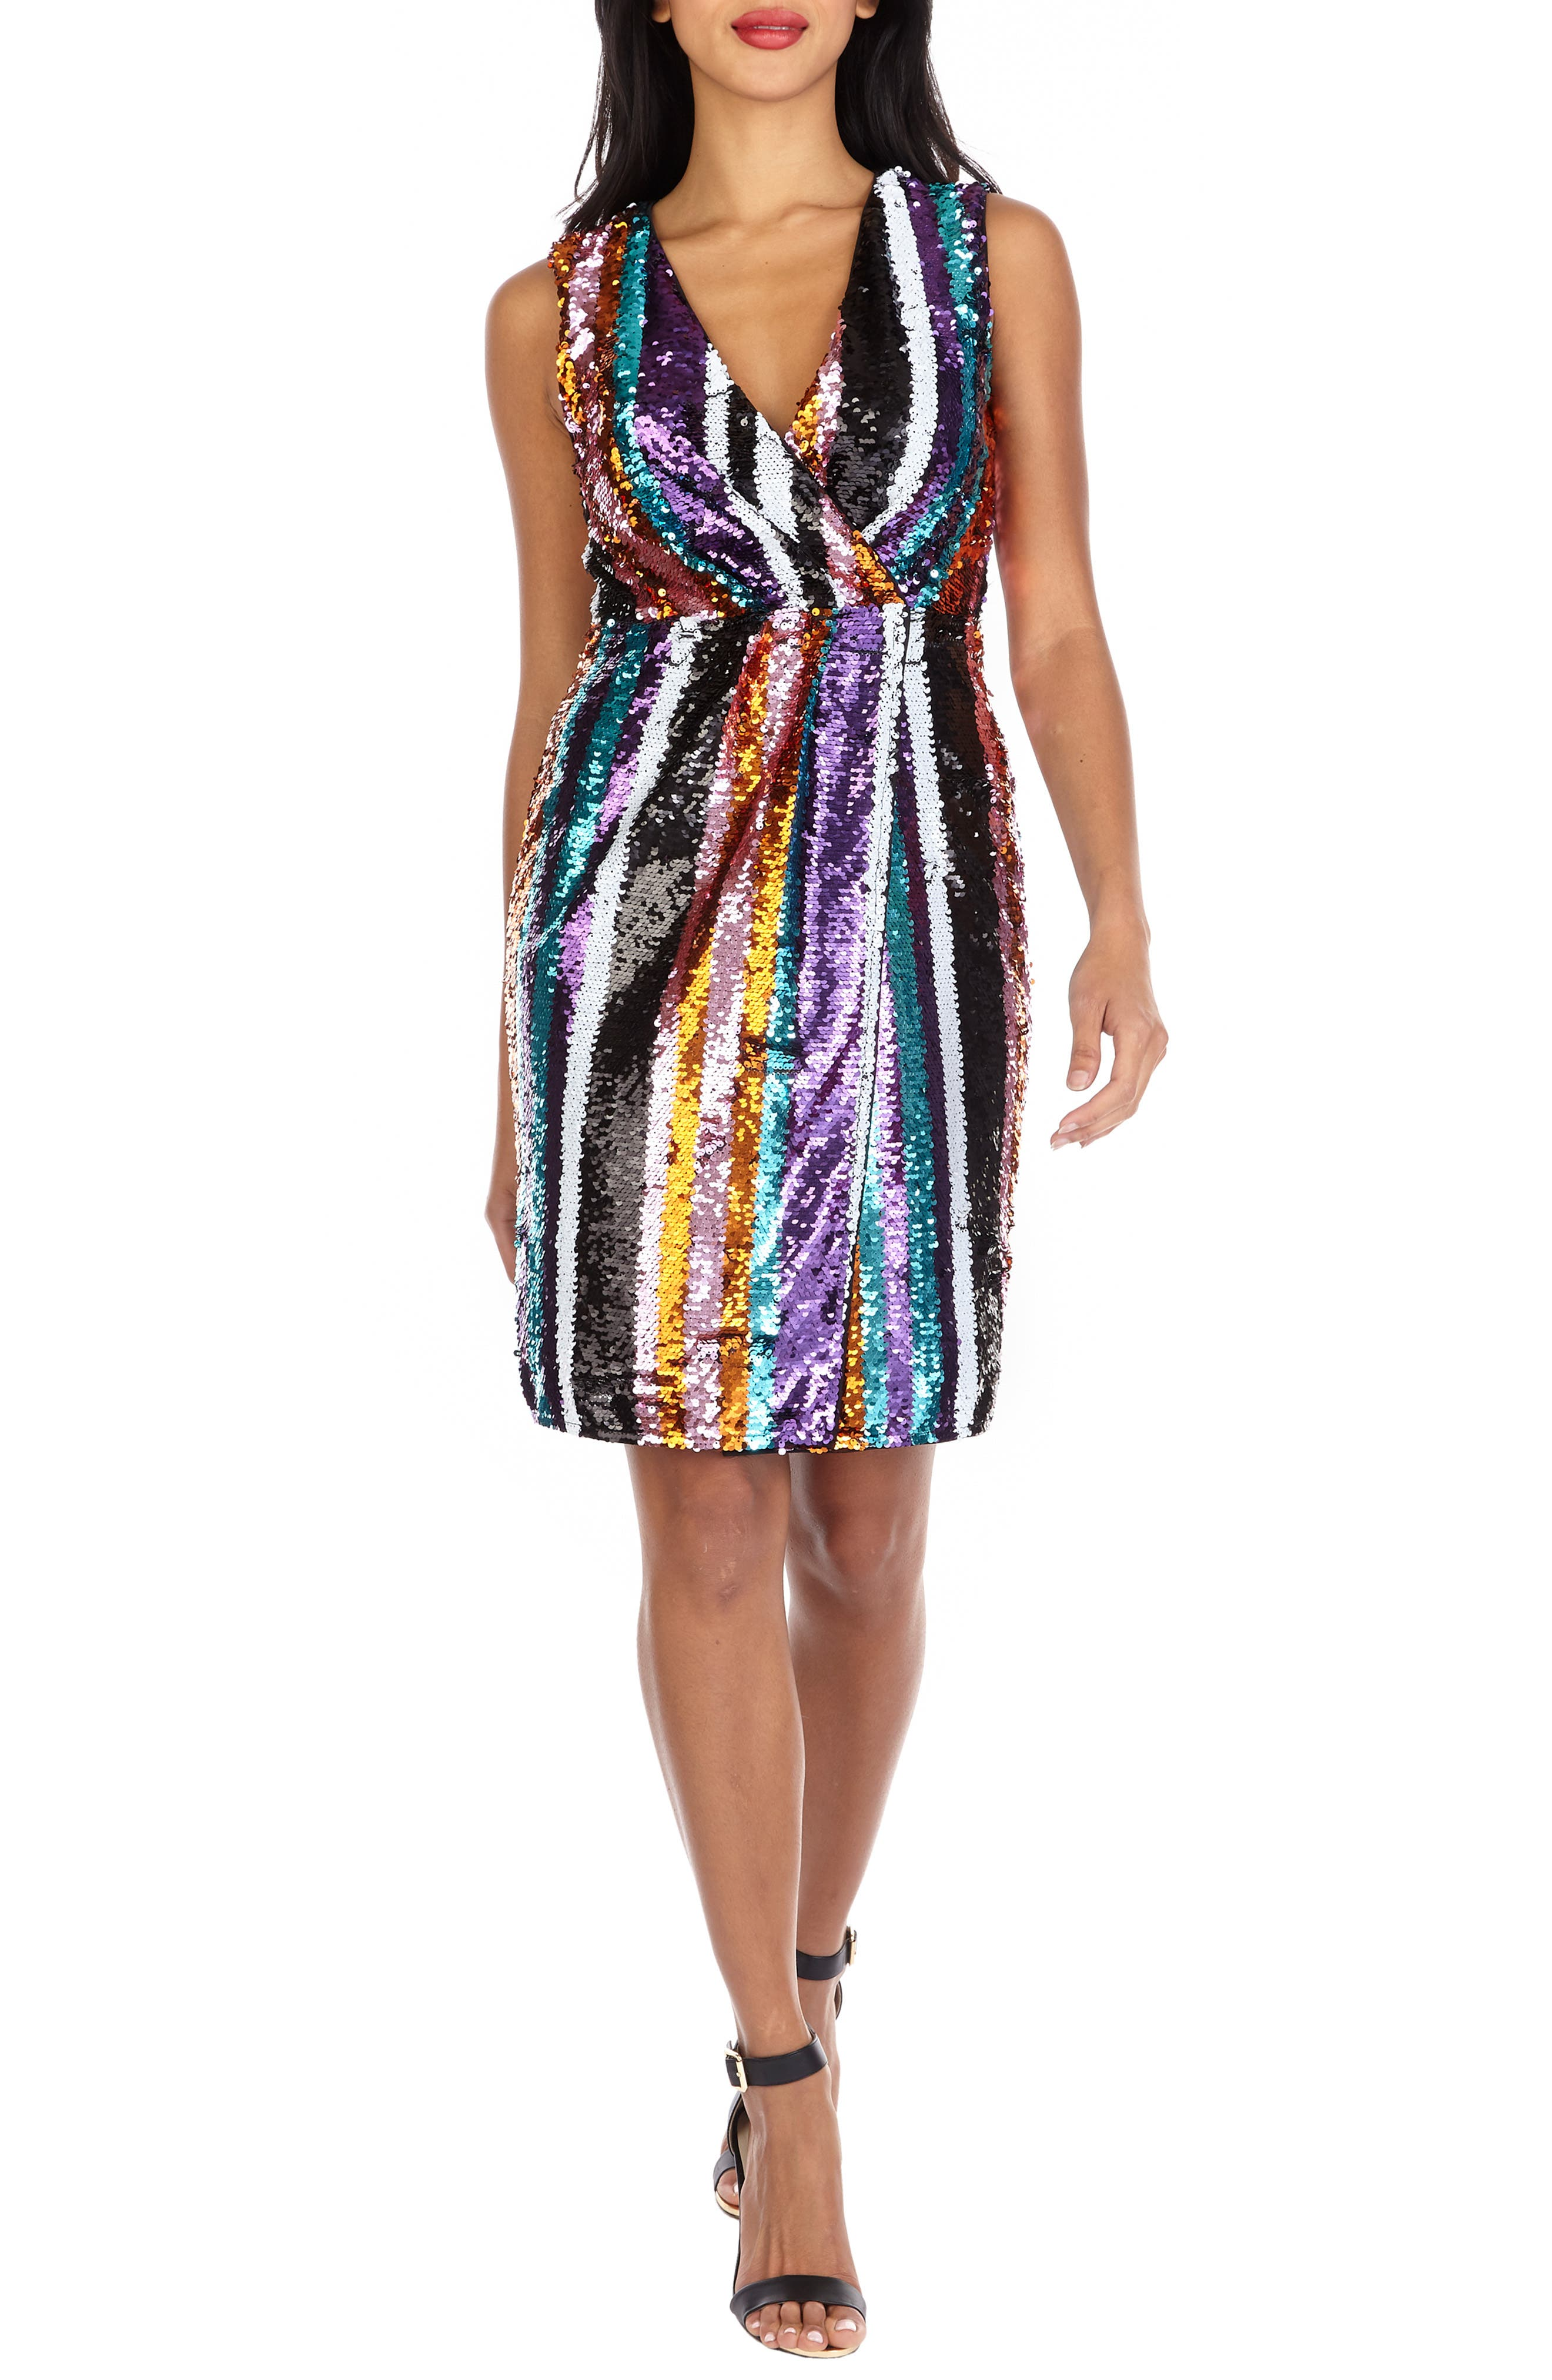 Sarah Rainbow Sequin Stripe Cocktail Sheath,                         Main,                         color, MULTI PURPLE